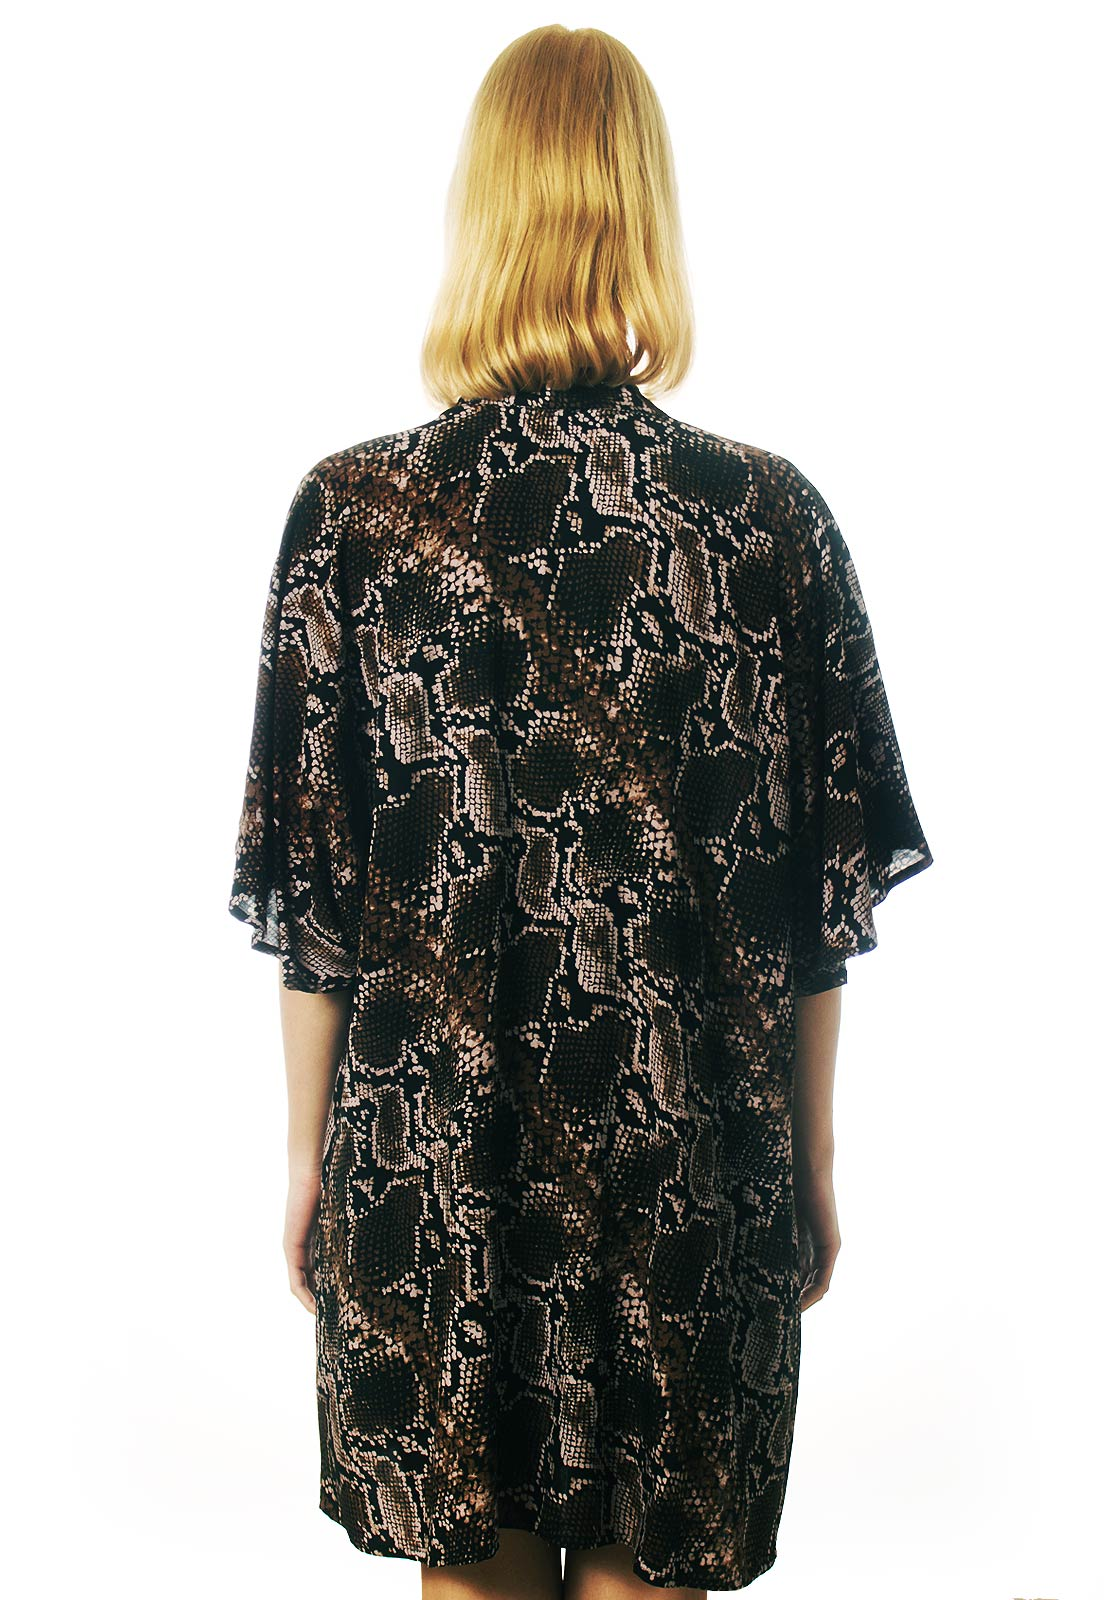 Kimono Kobra Cobra Estampado ElephunK Animal Print Feminino Masculino Moda Marrom